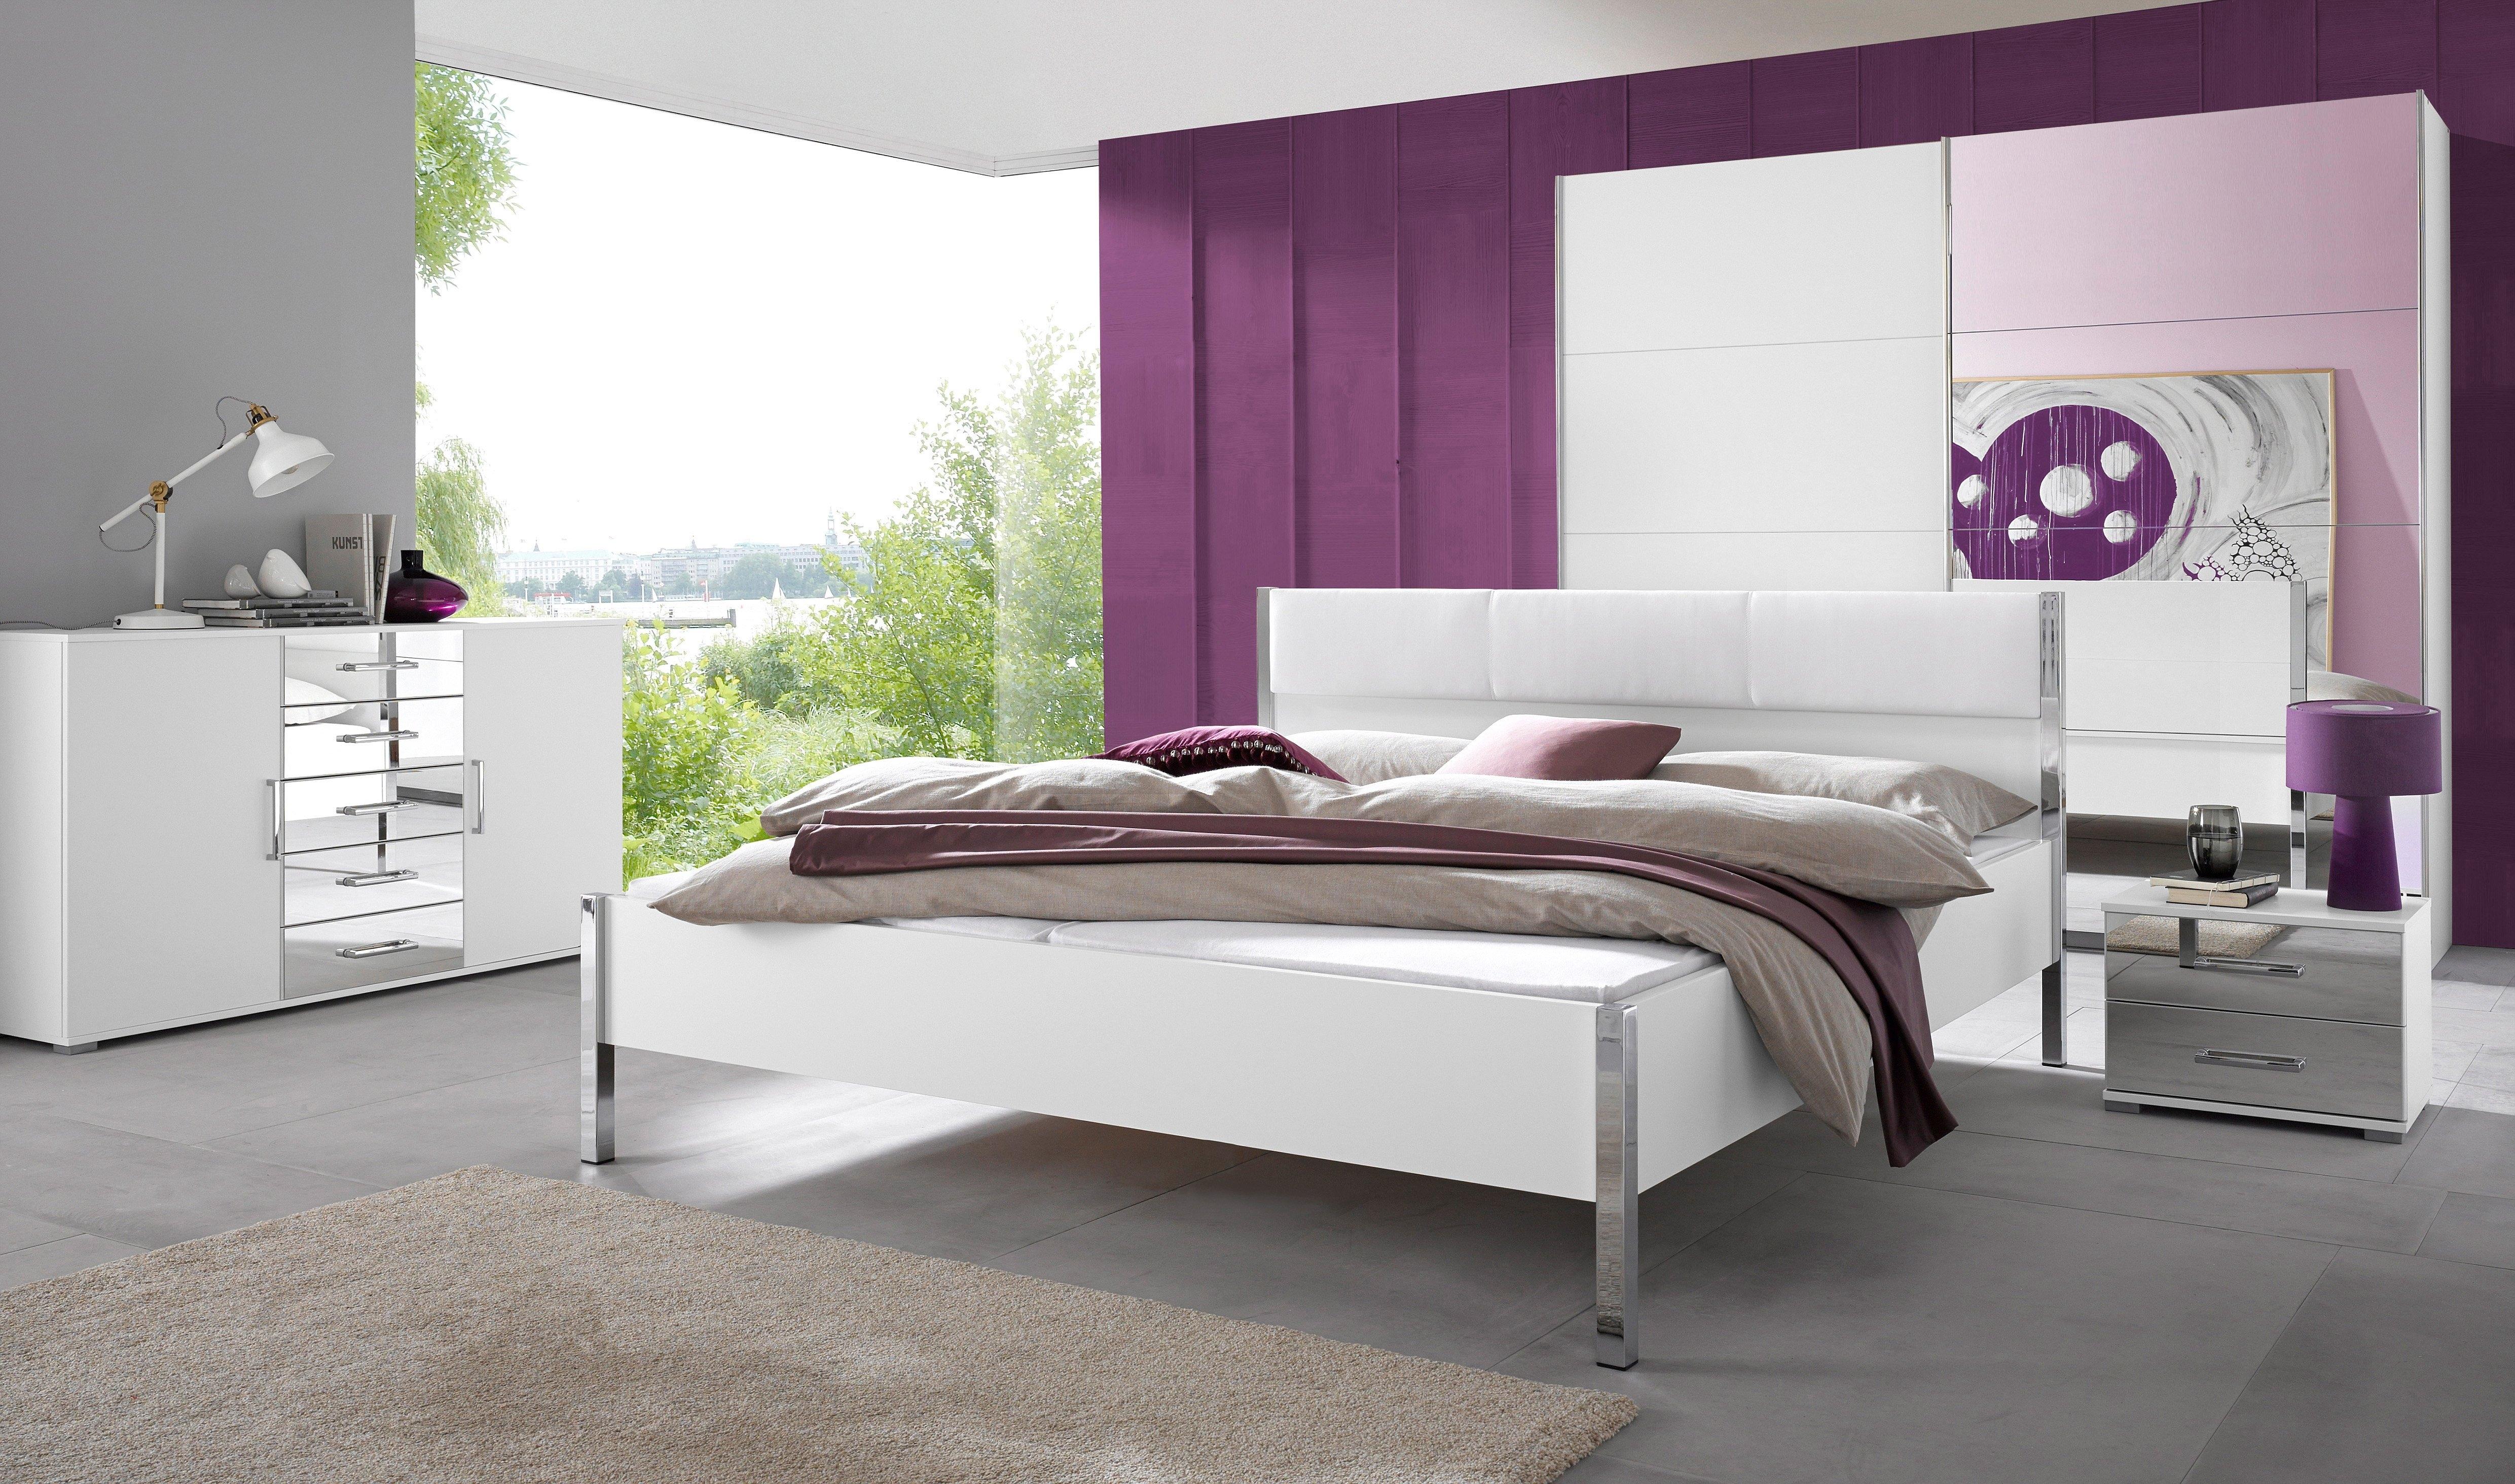 afbeeldingsbron rauch slaapkamermeubel in 4 delige set